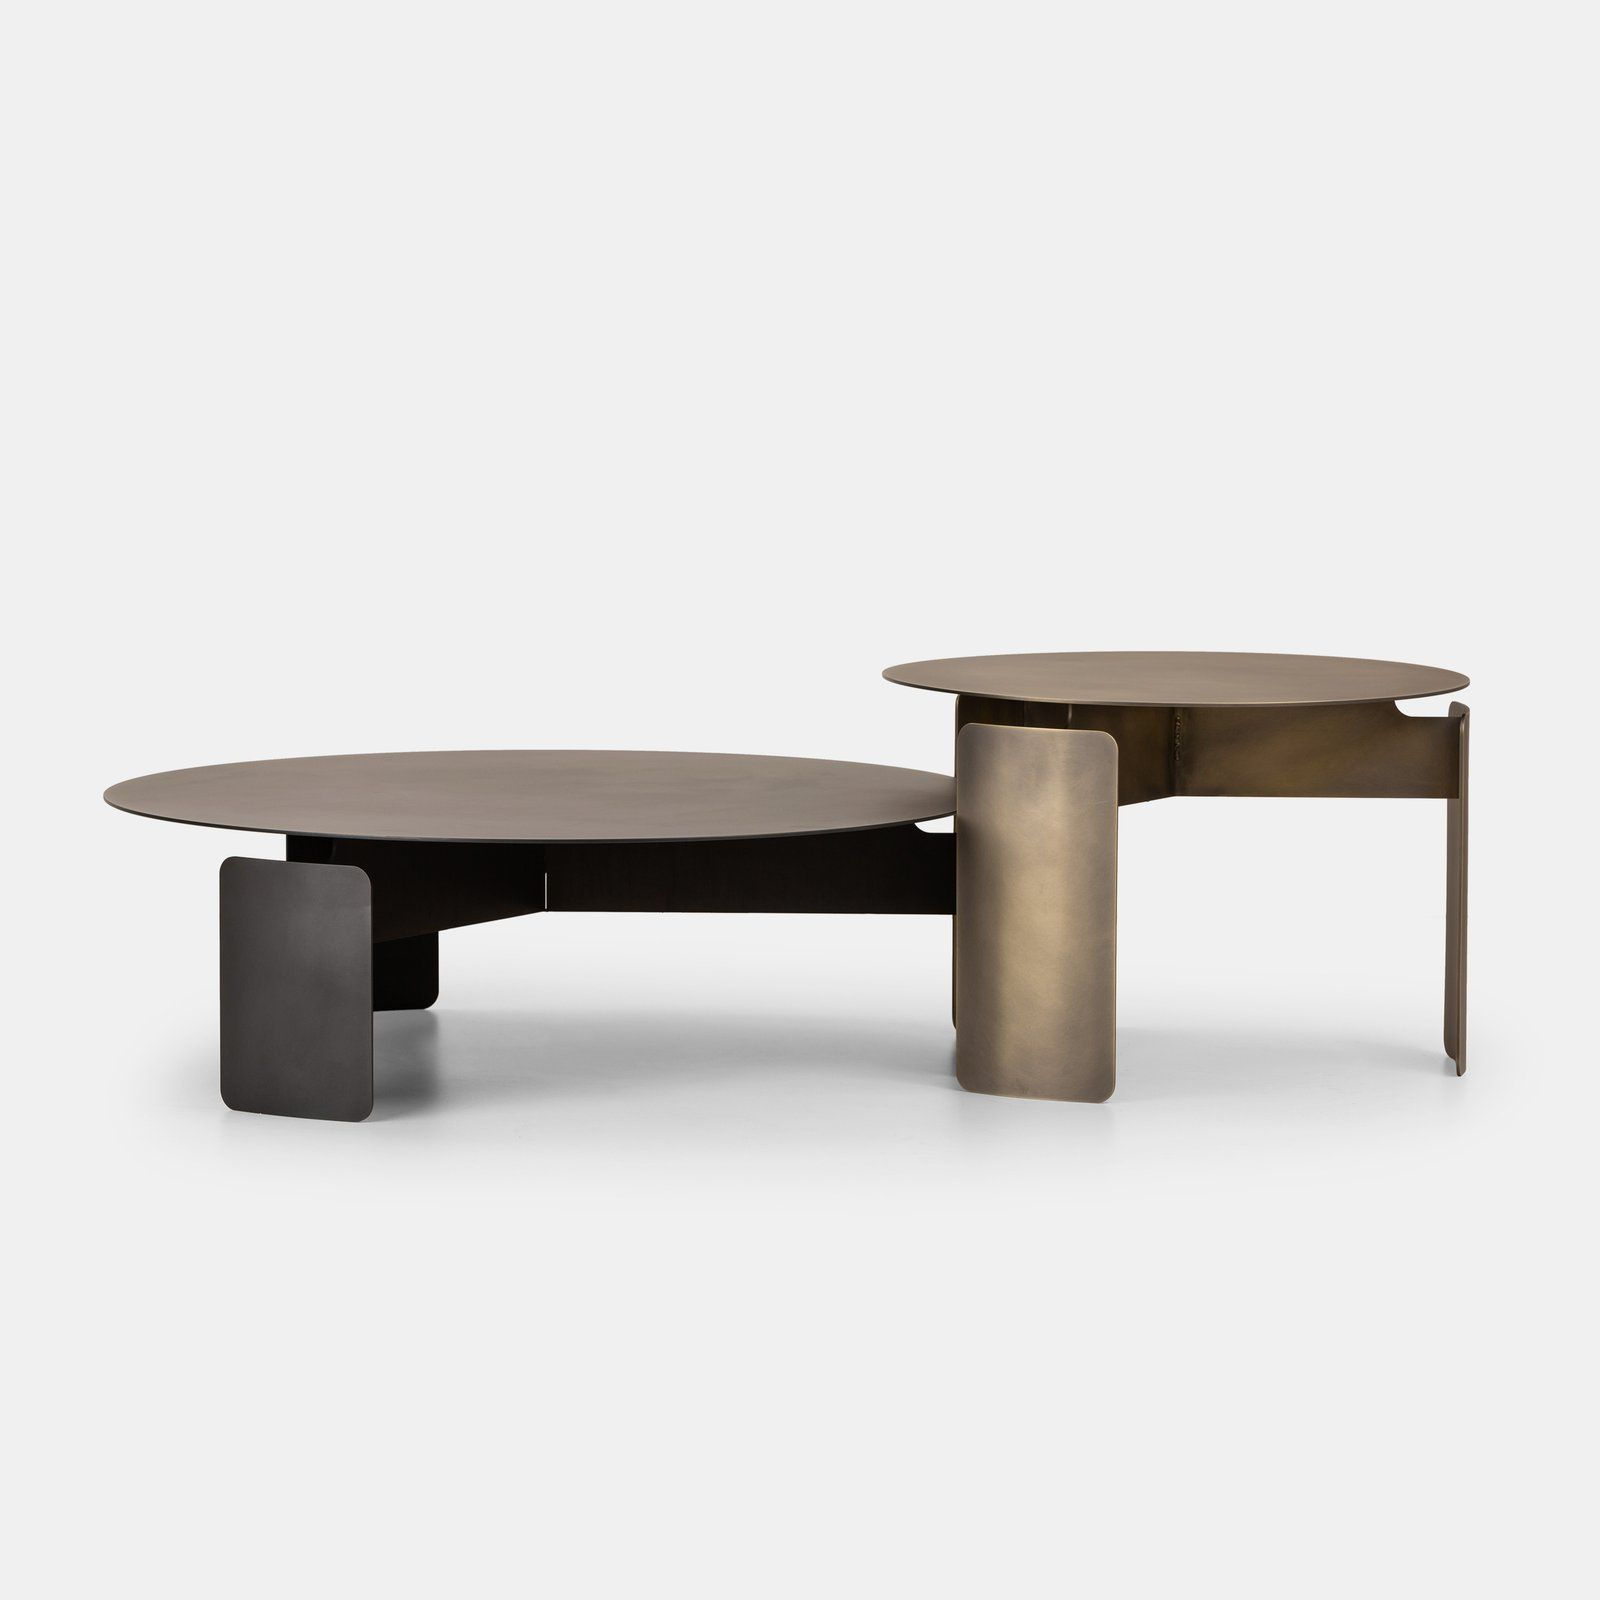 Shirudo Coffee Table Coffee Table Design Coffee Table Furniture Coffee Table Design Modern [ 1600 x 1600 Pixel ]